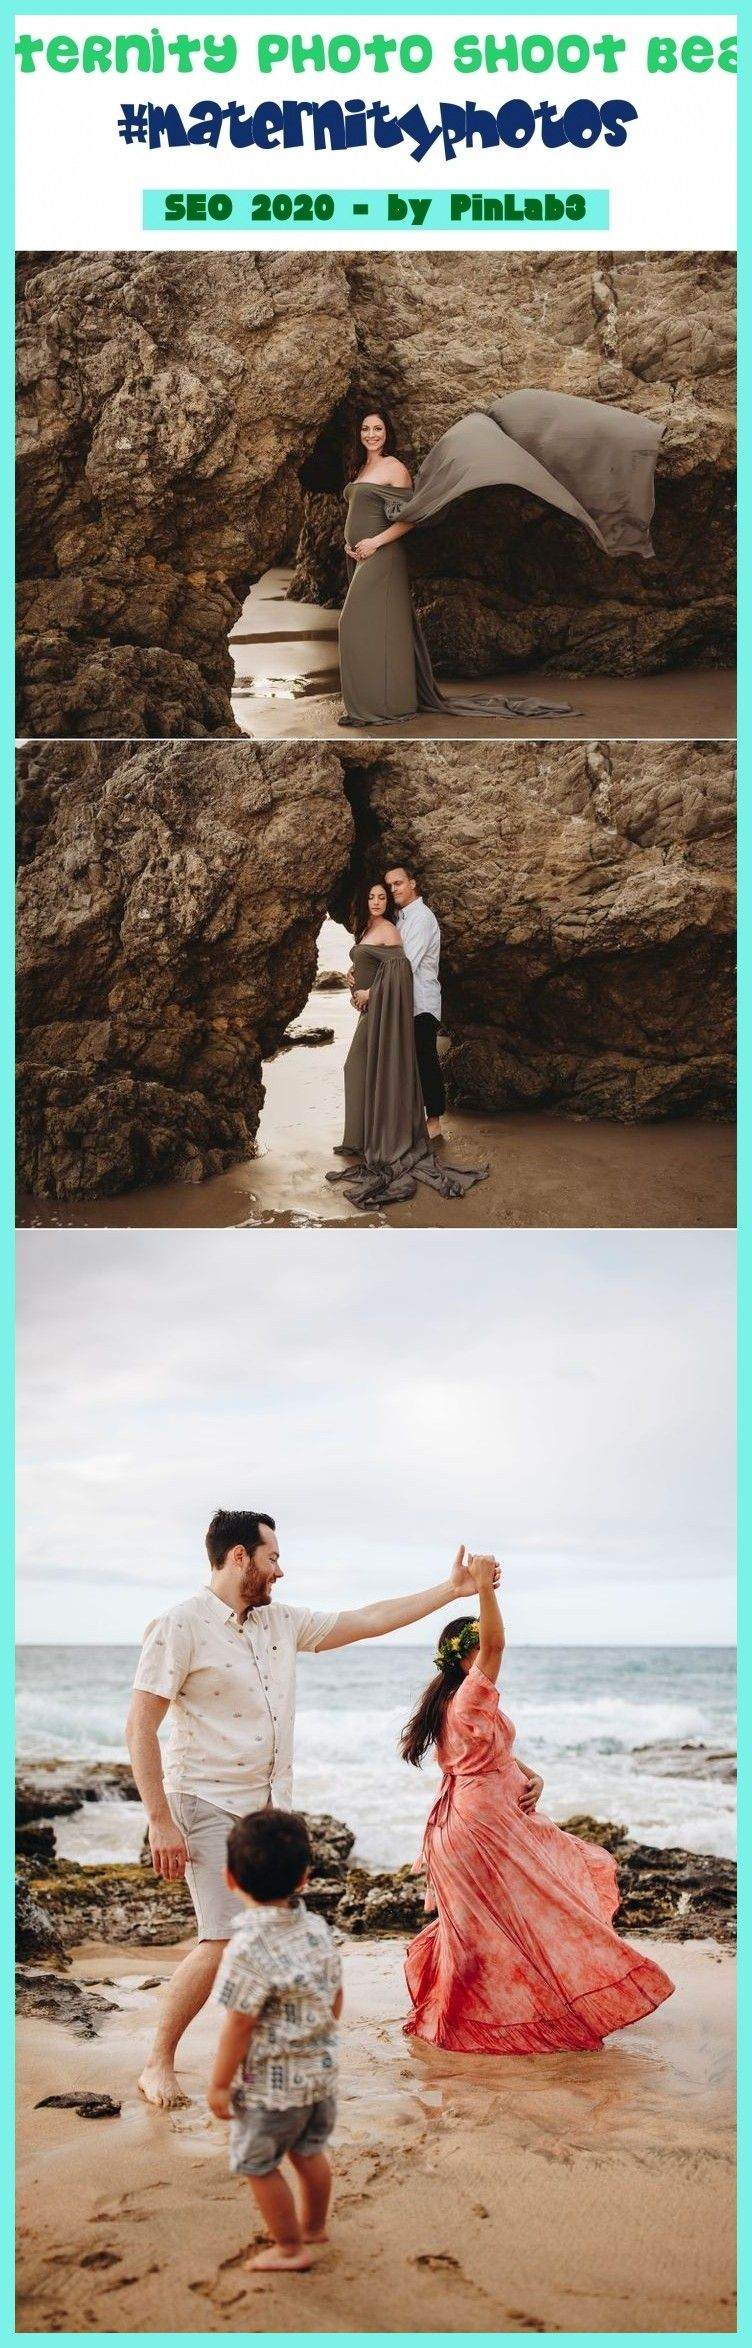 Photo of Maternity photo shoot beach #maternity #photo #shoot #beach #mutterschaft